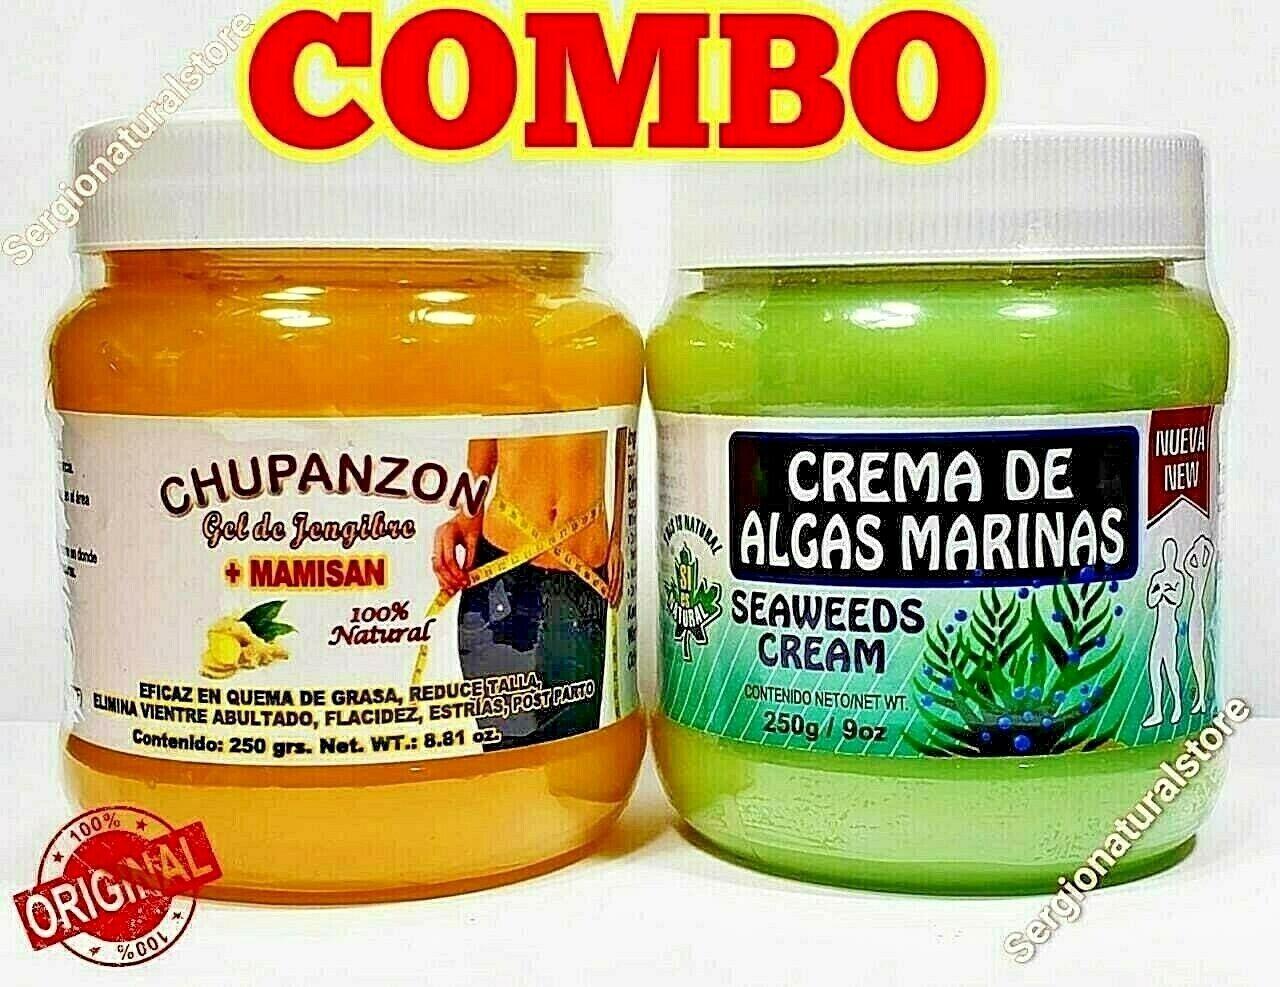 CREMA REDUCTORA DE ALGAS MARINAS BODY CREAM REDUCING 250 grs. QUEMADOR DE GRASA